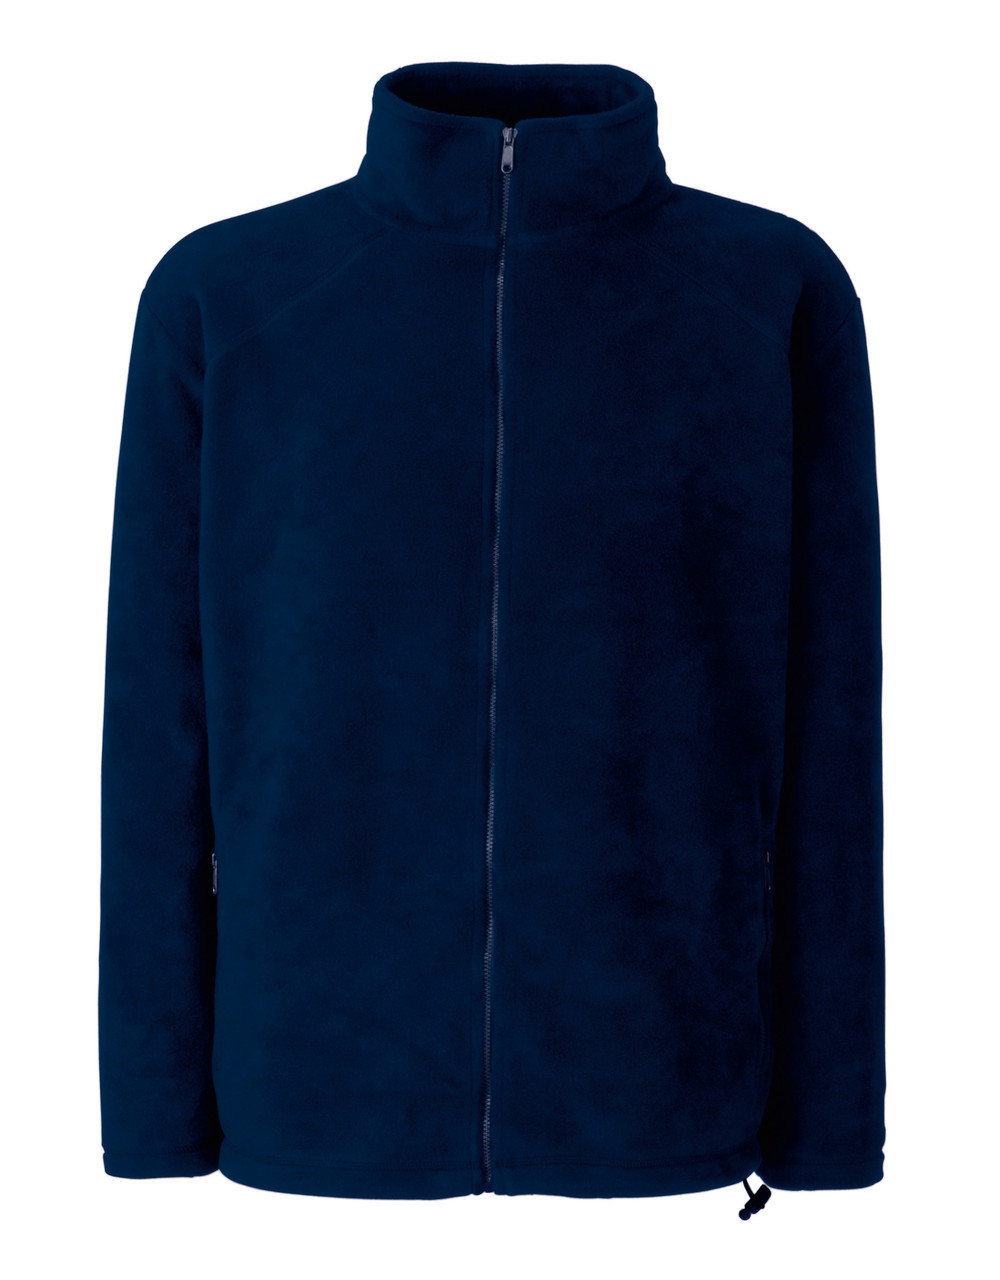 Мужской тёплый флис на молнии Глубоко Тёмно-Синий Full Zip Fleece 62-510-AZ S